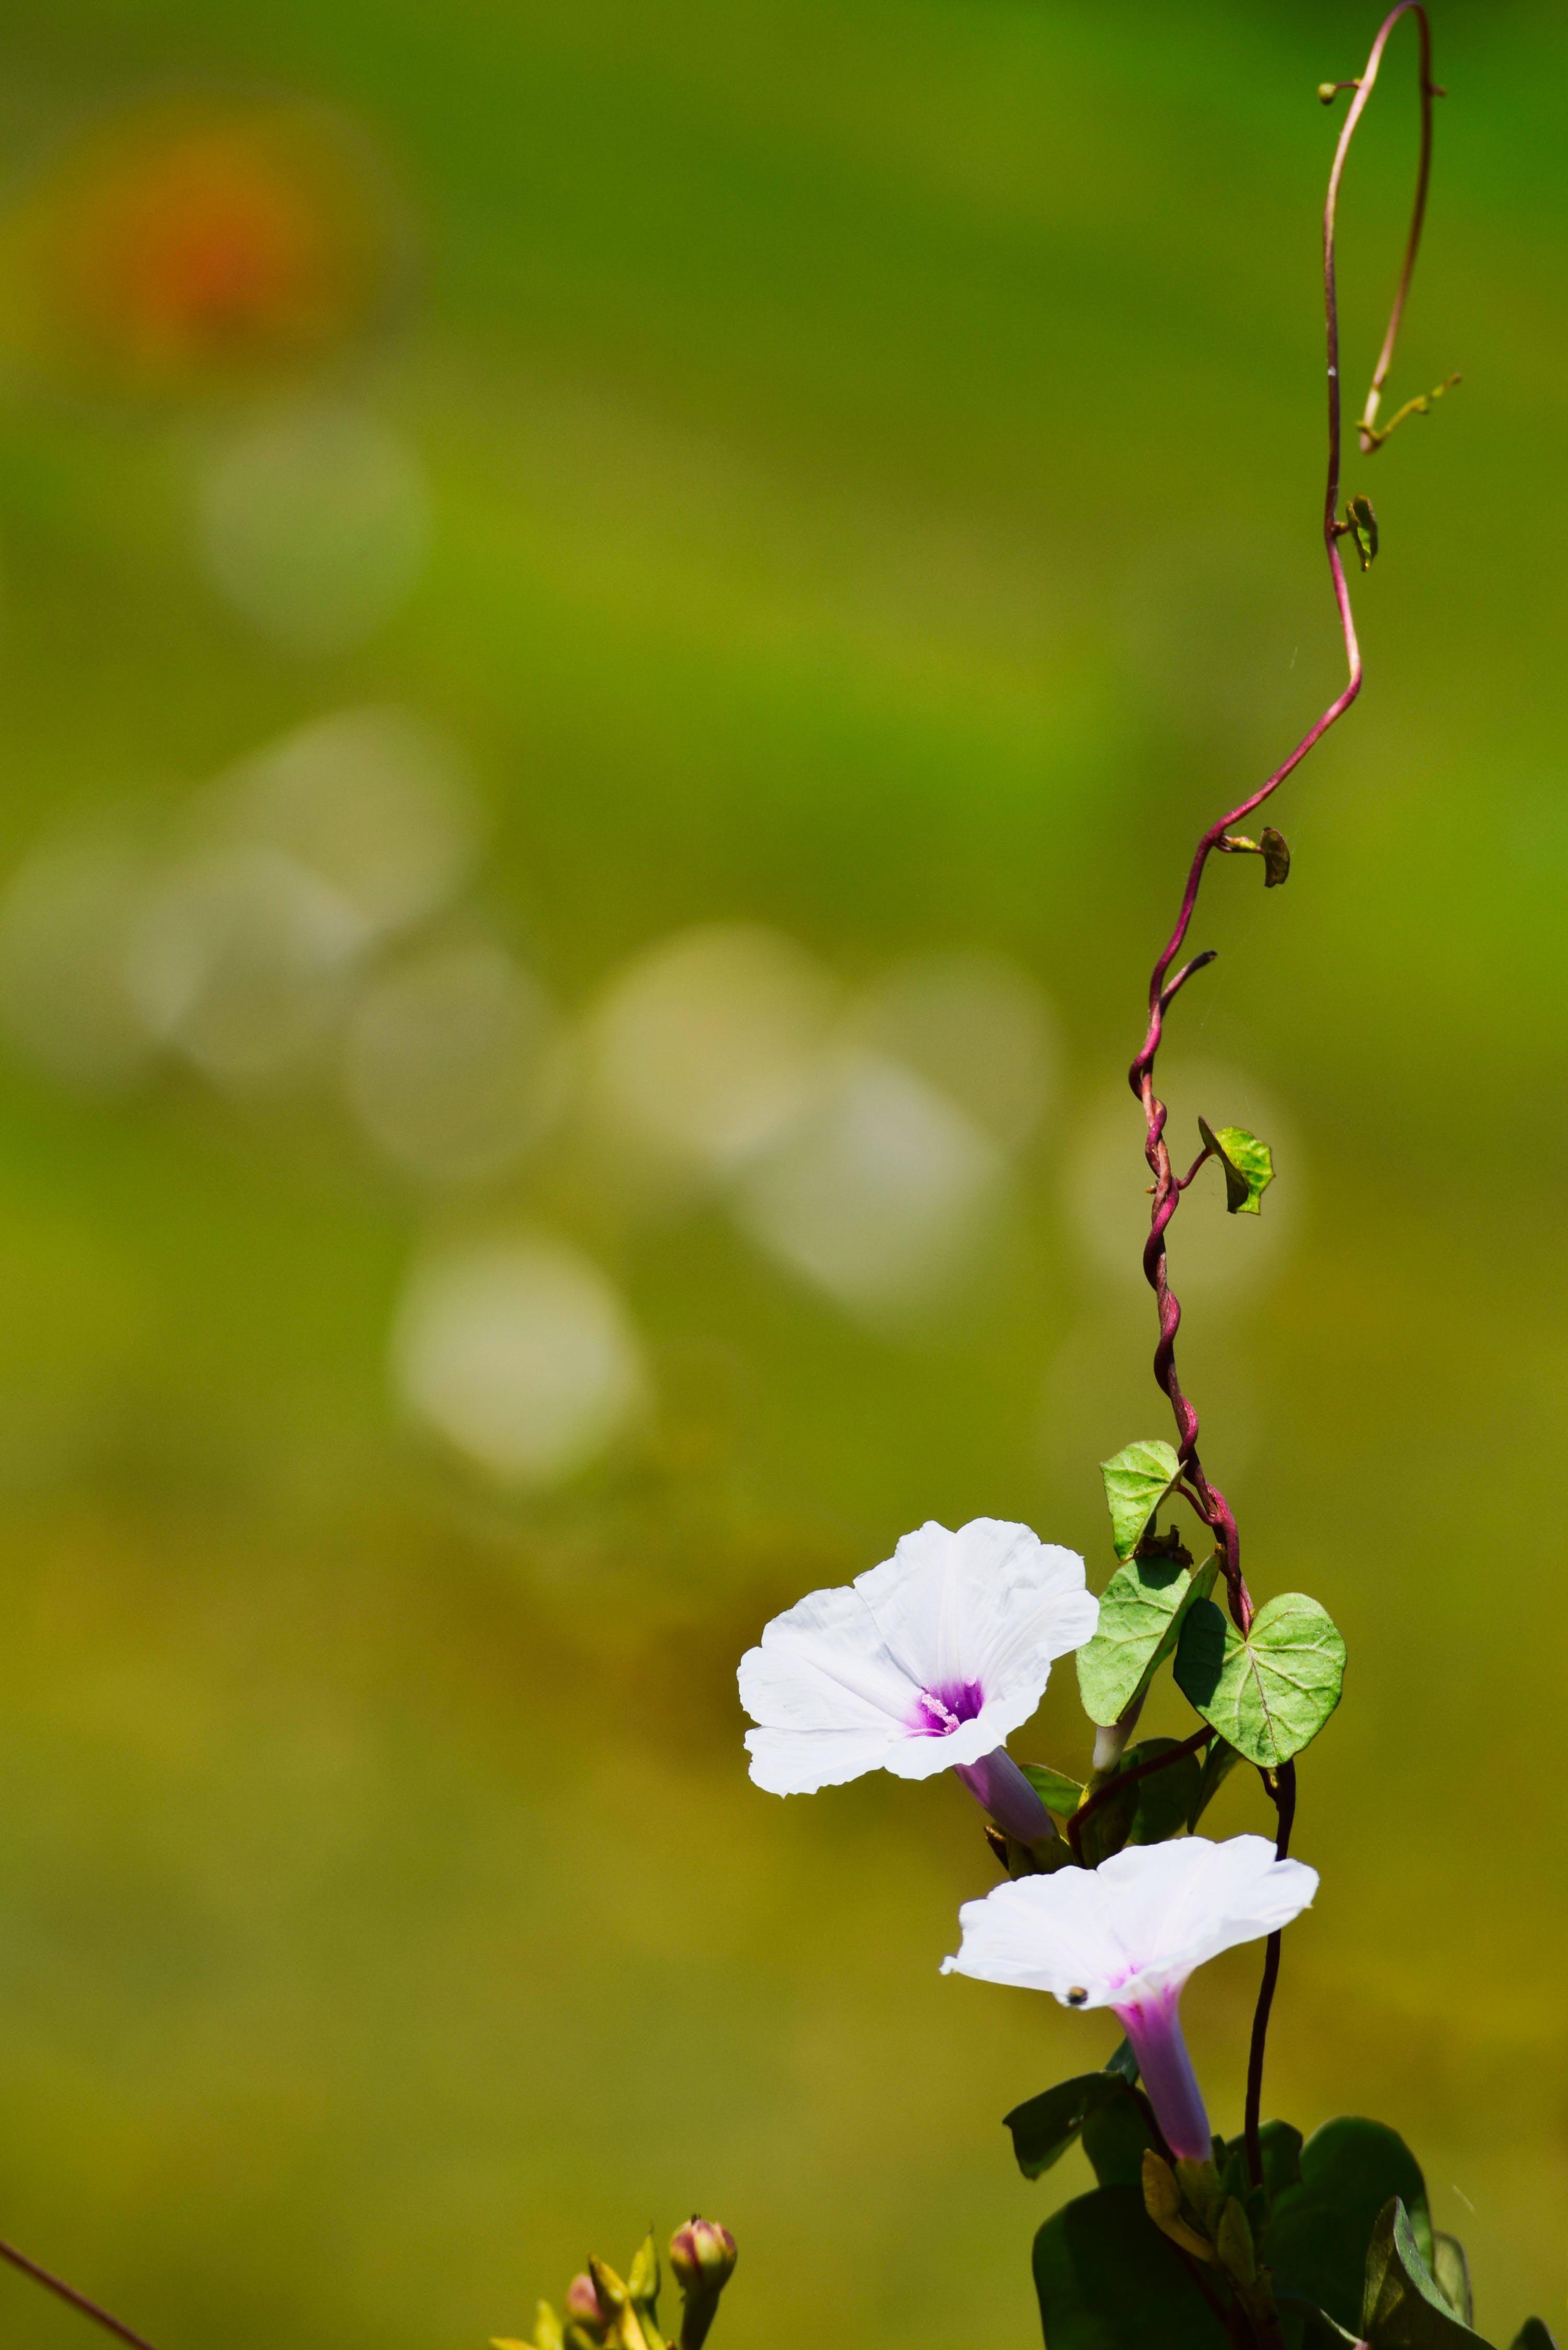 flowers, india, nature